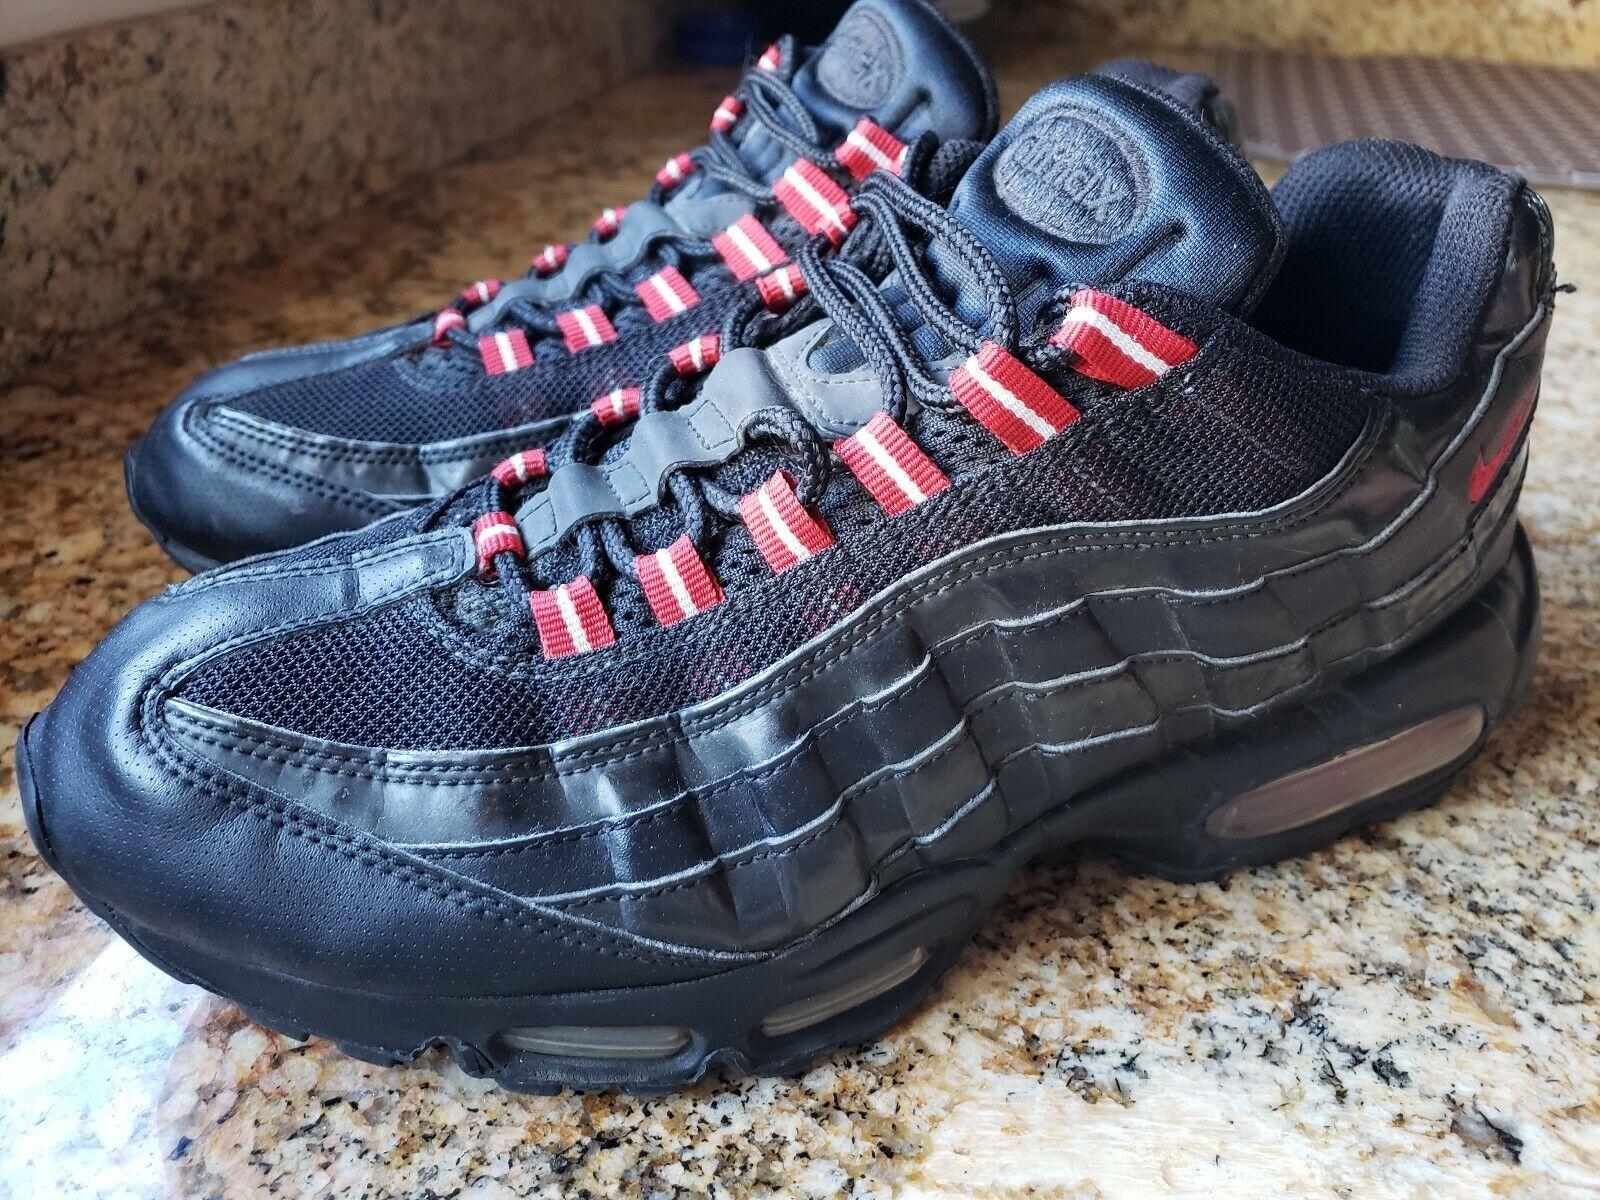 Nike Air Max 95 size 10 Black Varsity Red Sneakers [609048-037]